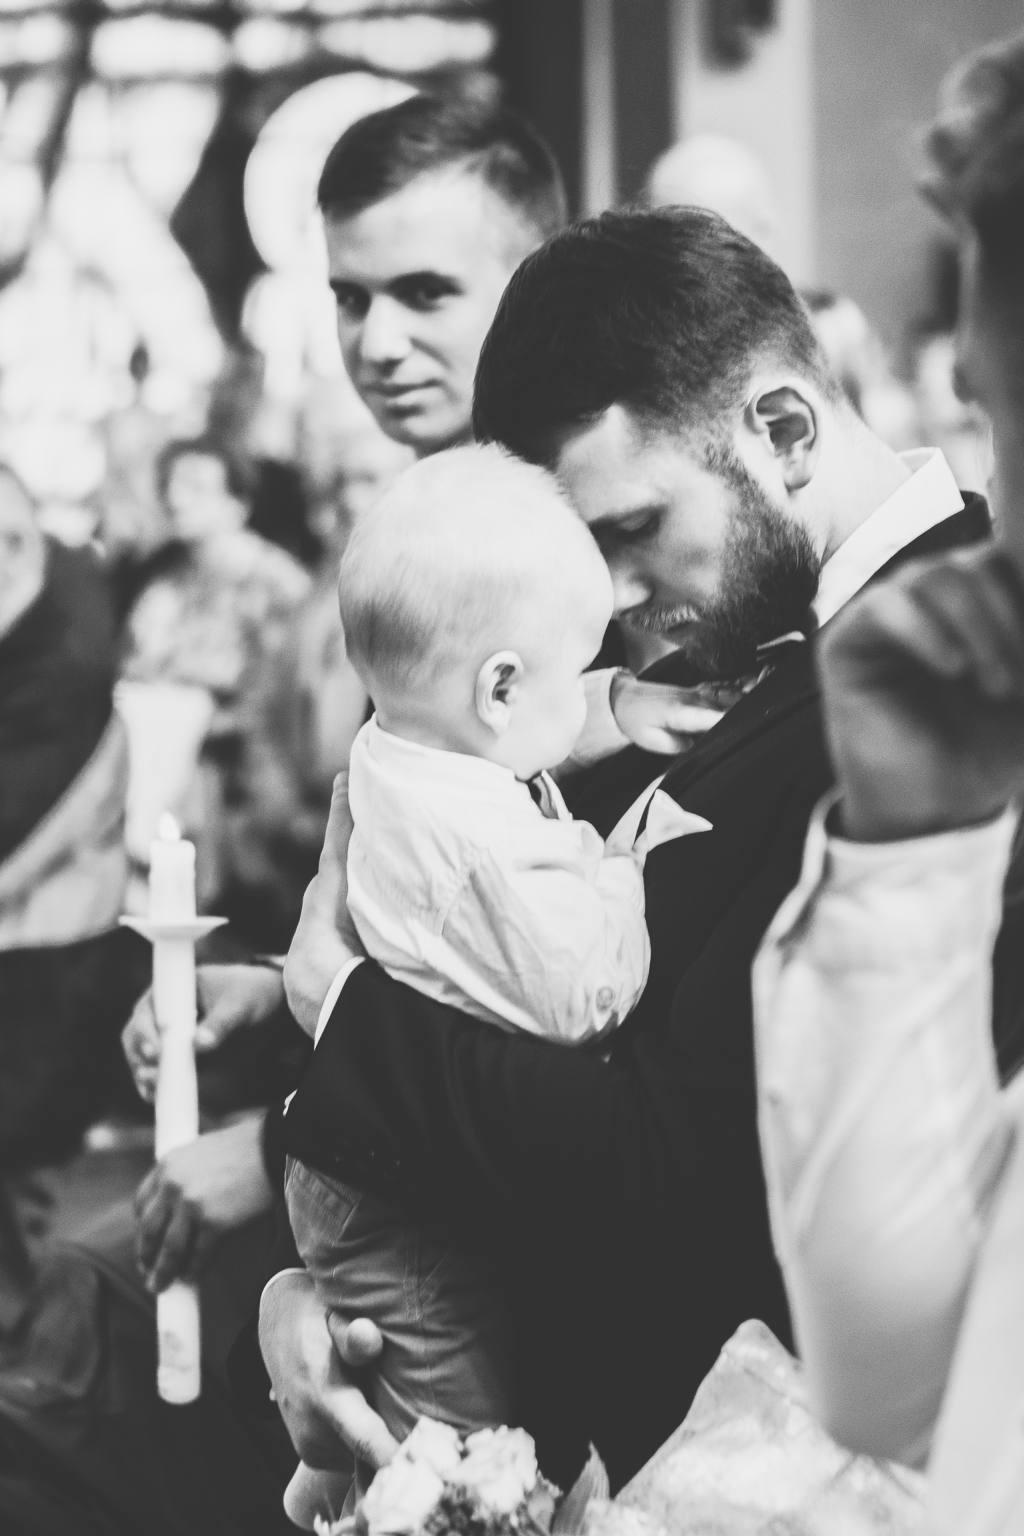 chrzest trójmiasto